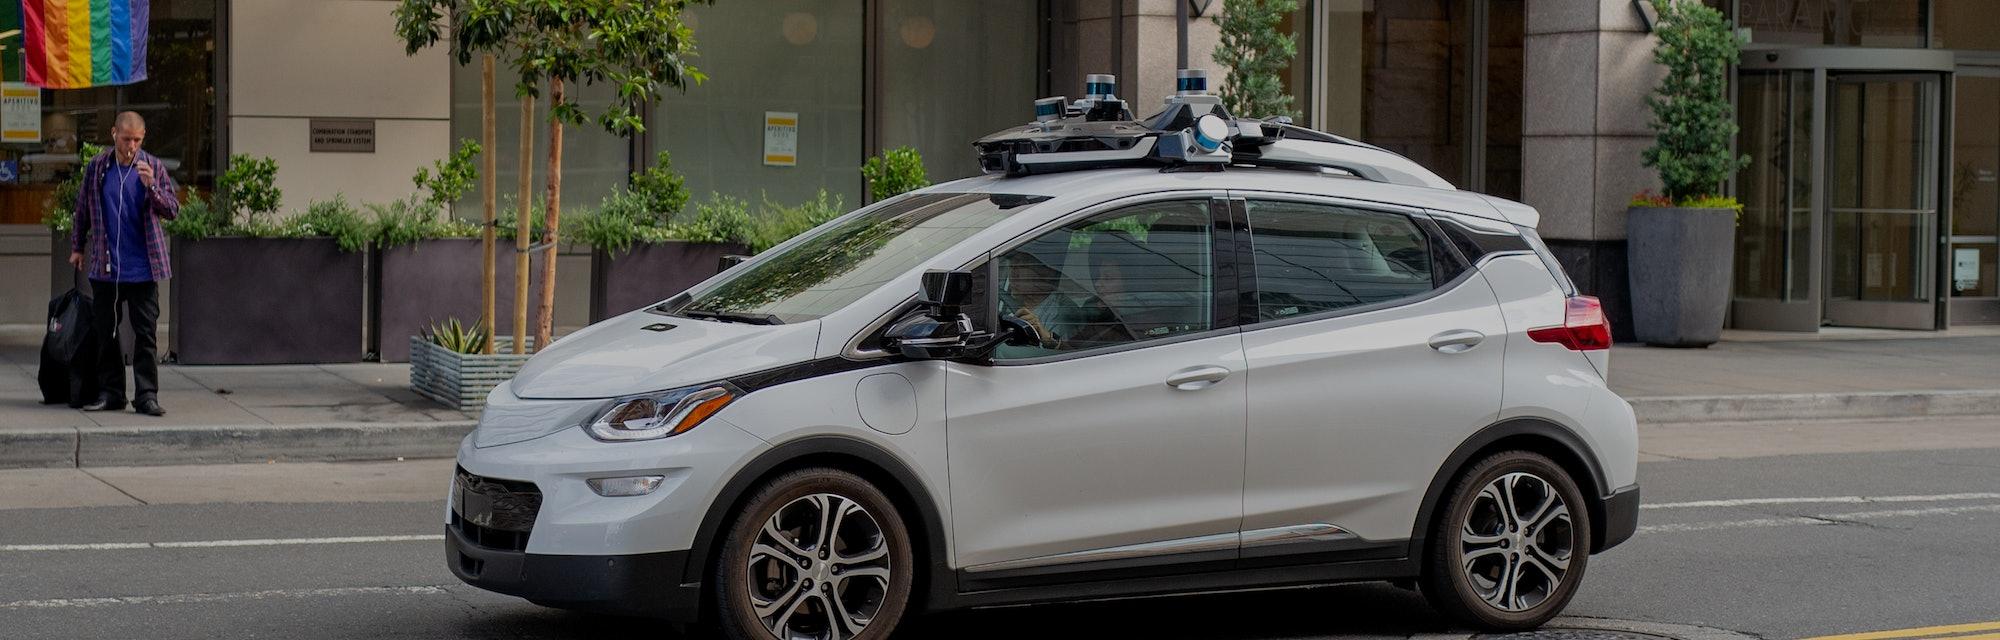 A Cruise Chevrolet Bolt experimental self-driving car from automaker General Motors and autonomous c...